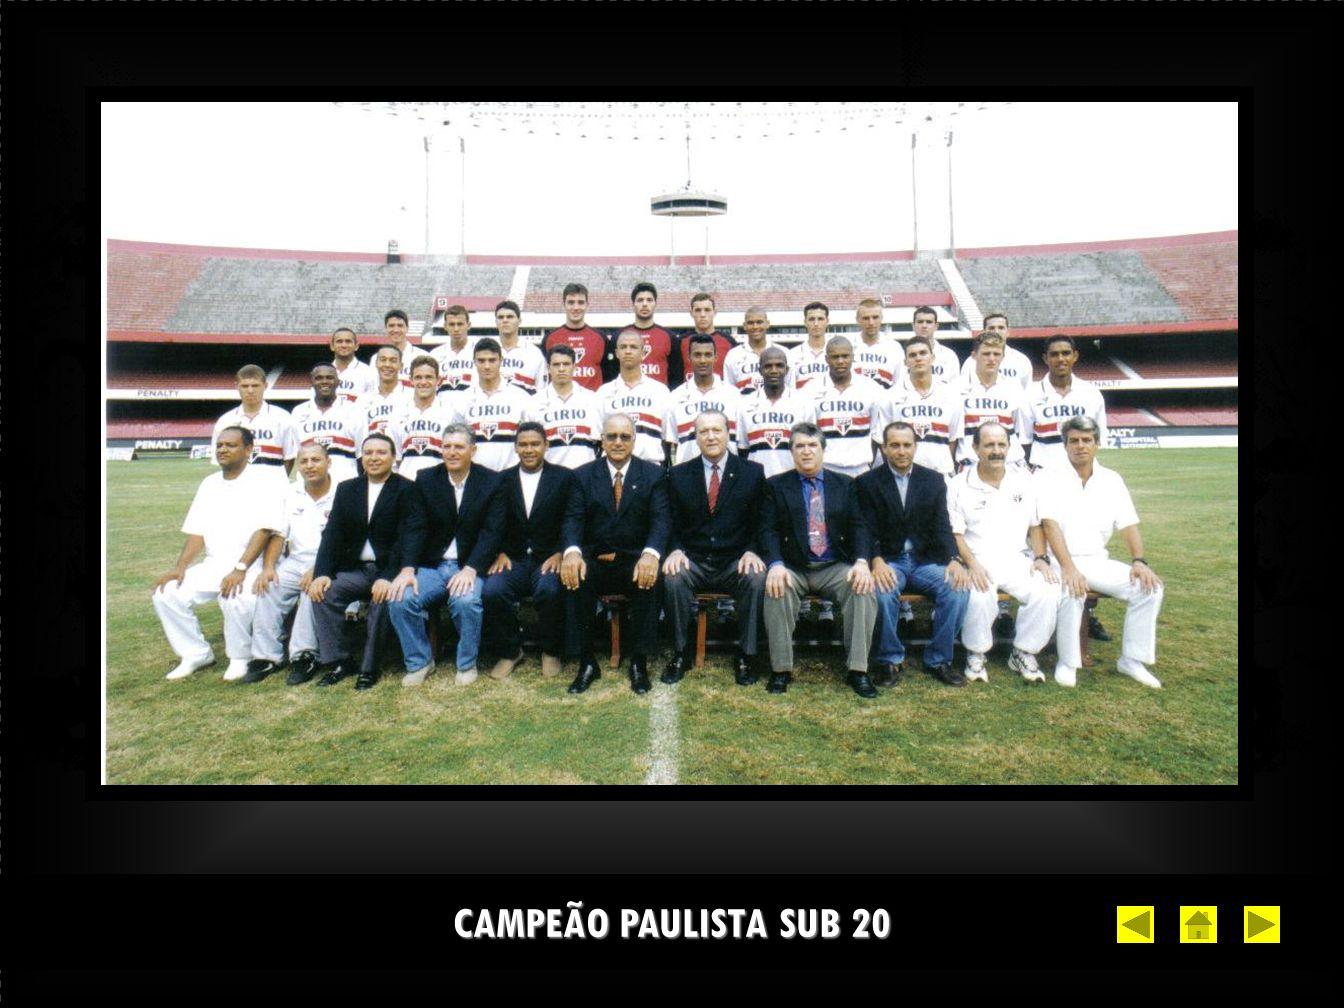 CAMPEÃO PAULISTA SUB 20